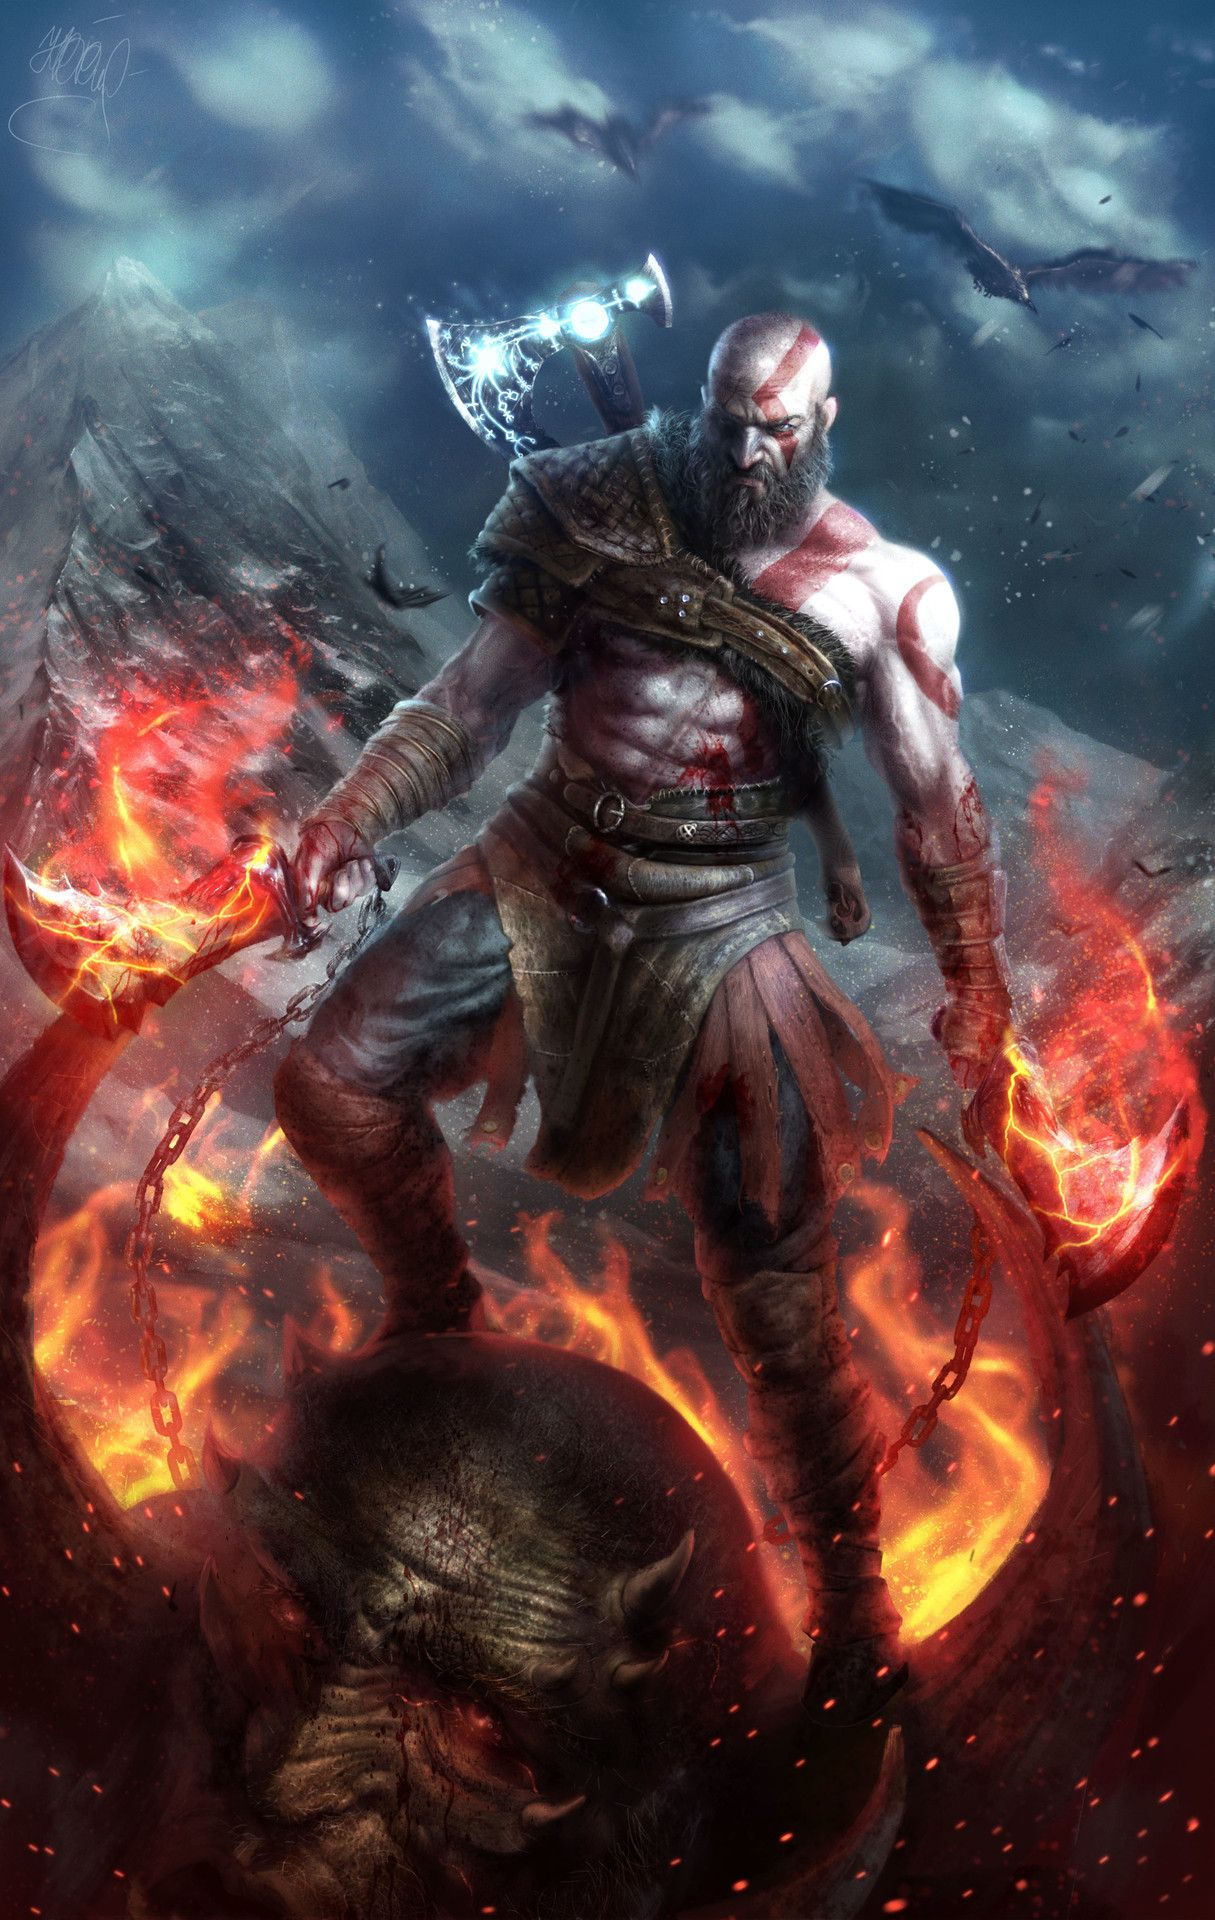 Old Weapons Kratos God Of War Kratos The God Of War Dios De La